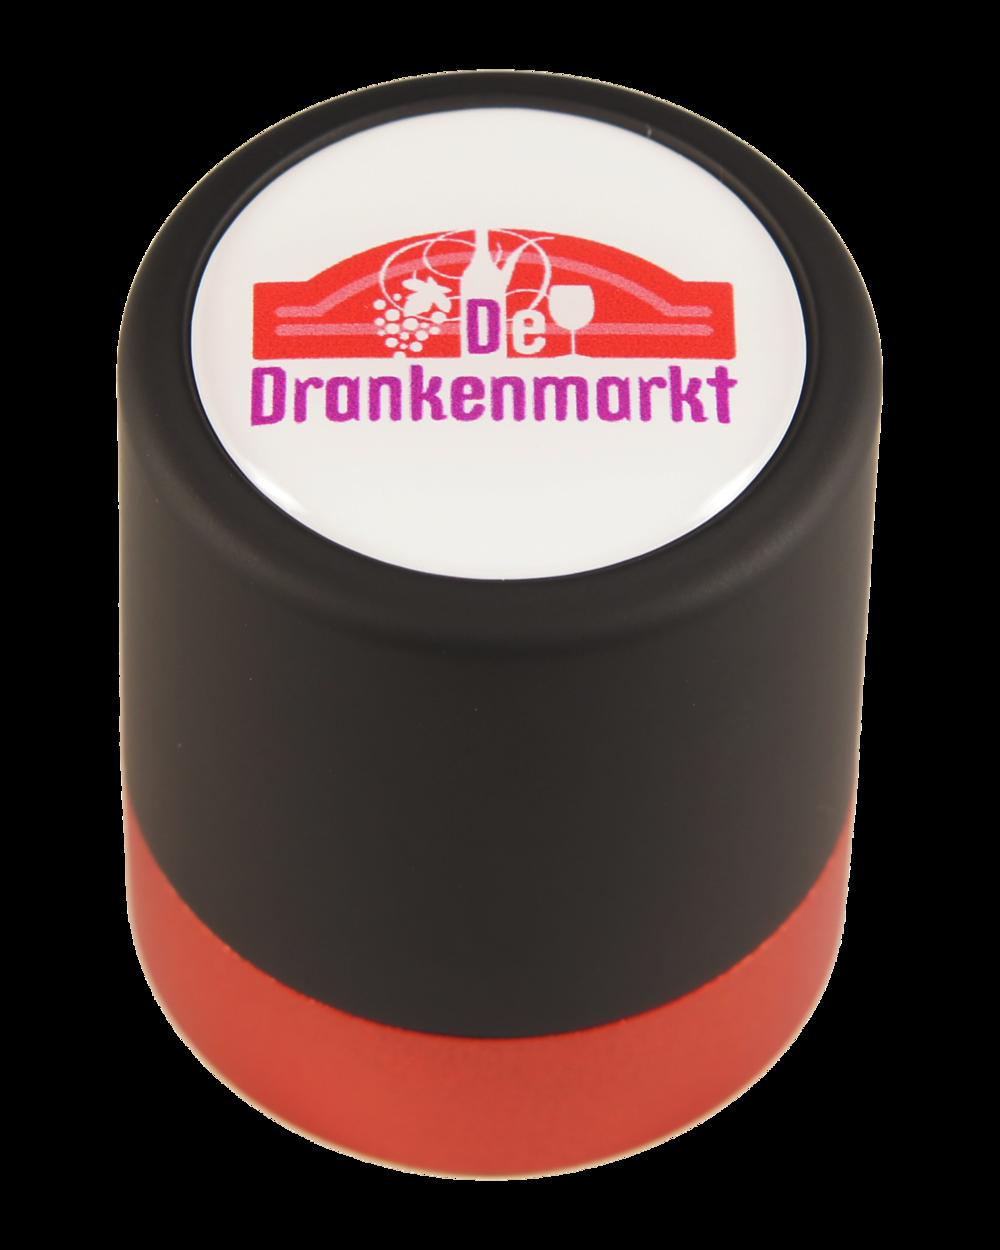 Champagne - Black - Red - Drankenmarkt .png